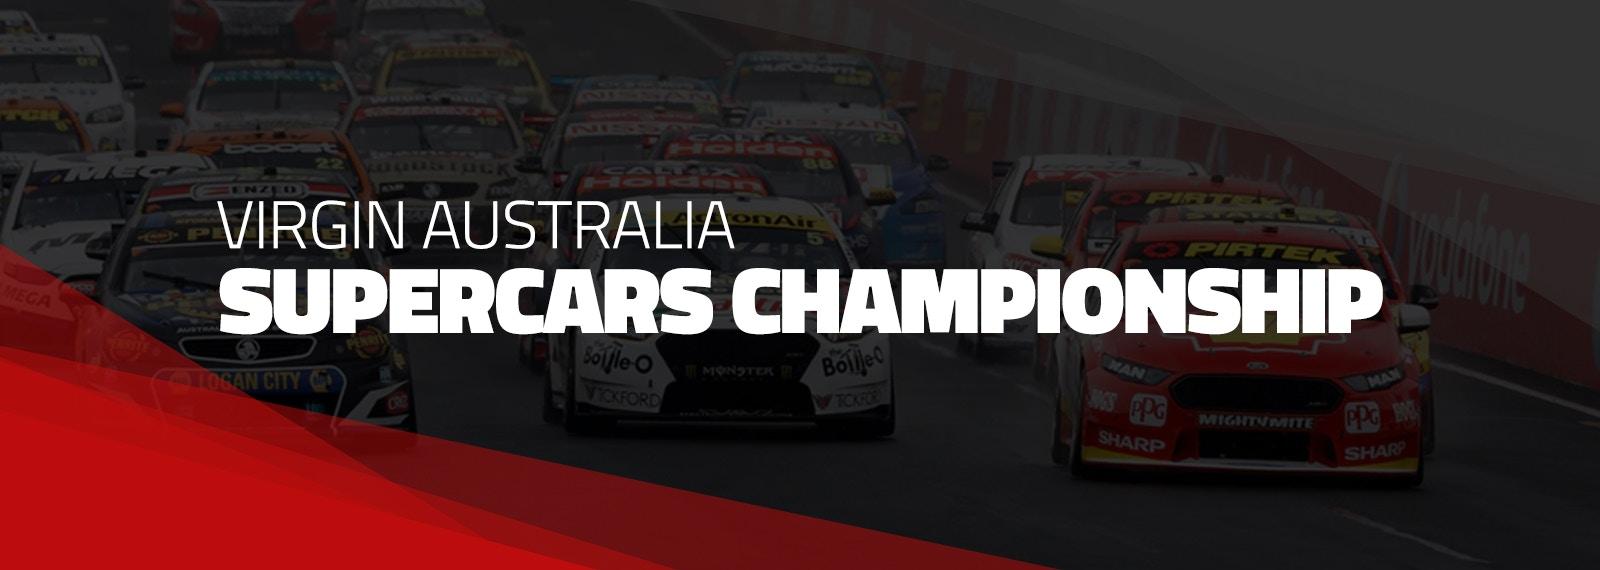 2018 Virgin Supercars Championship on youtube basketball, youtube football, youtube trophy,